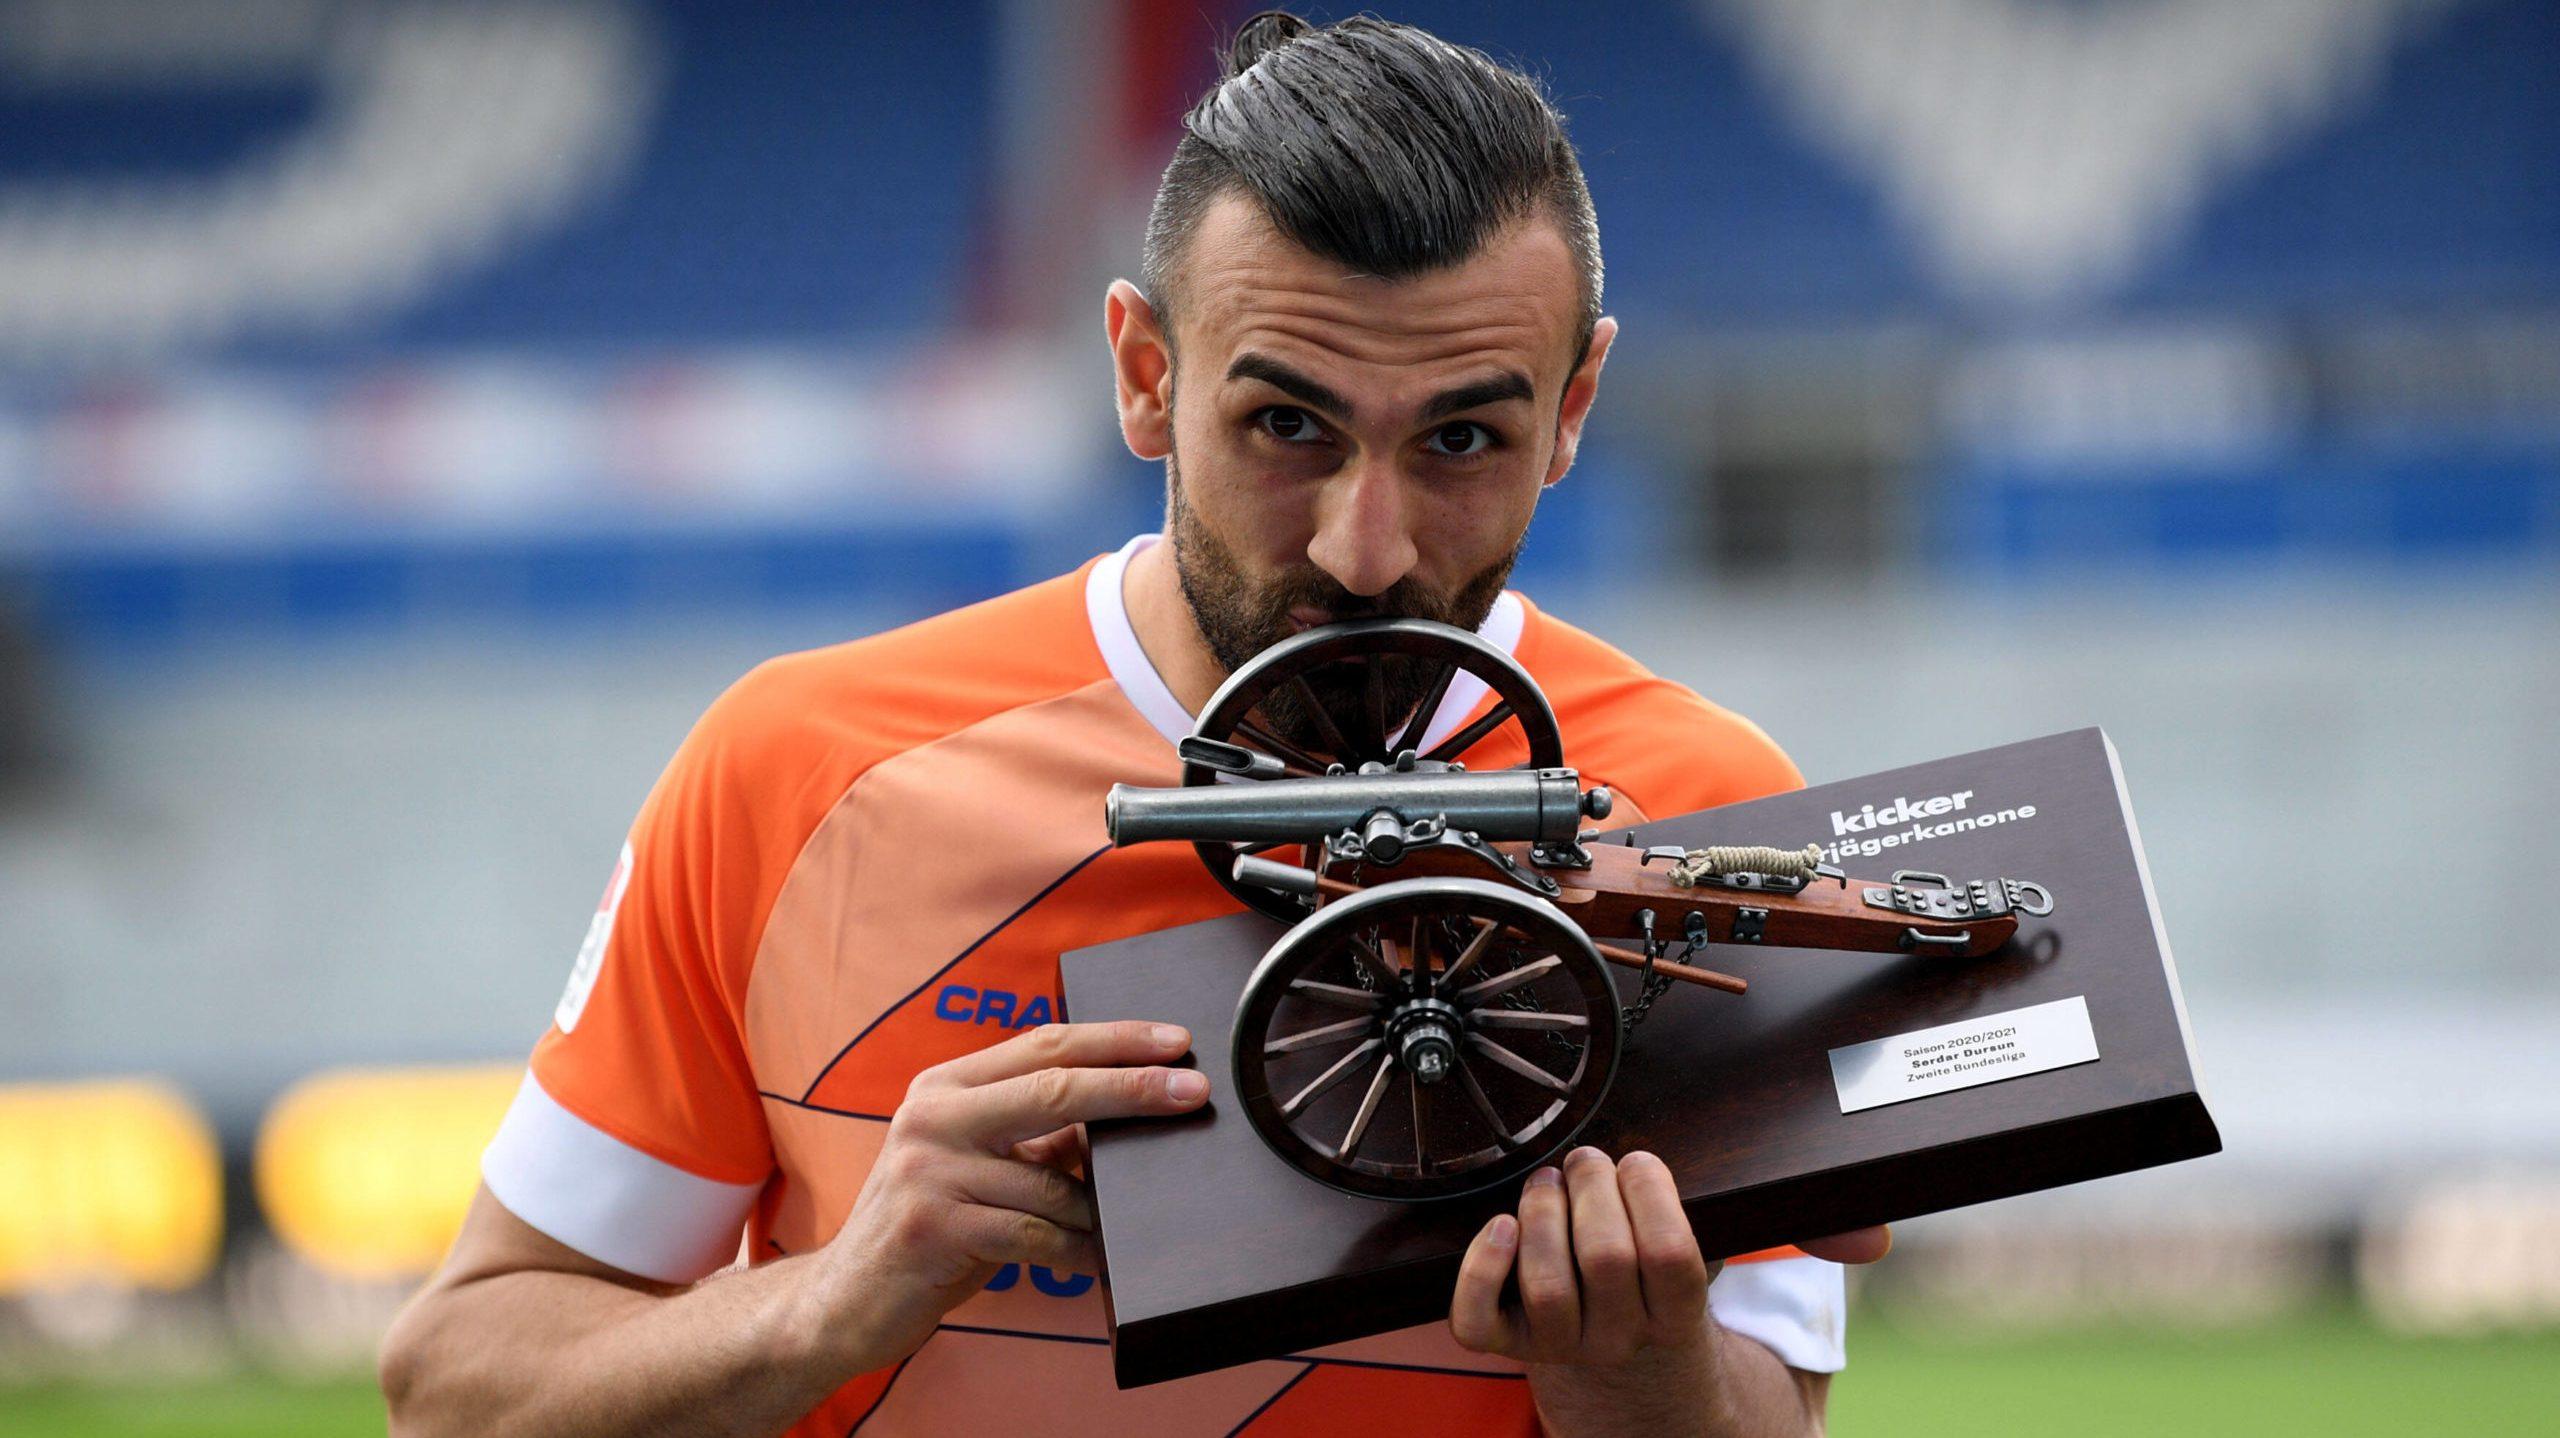 Dursun wird Torschützenkönig der 2. Bundesliga